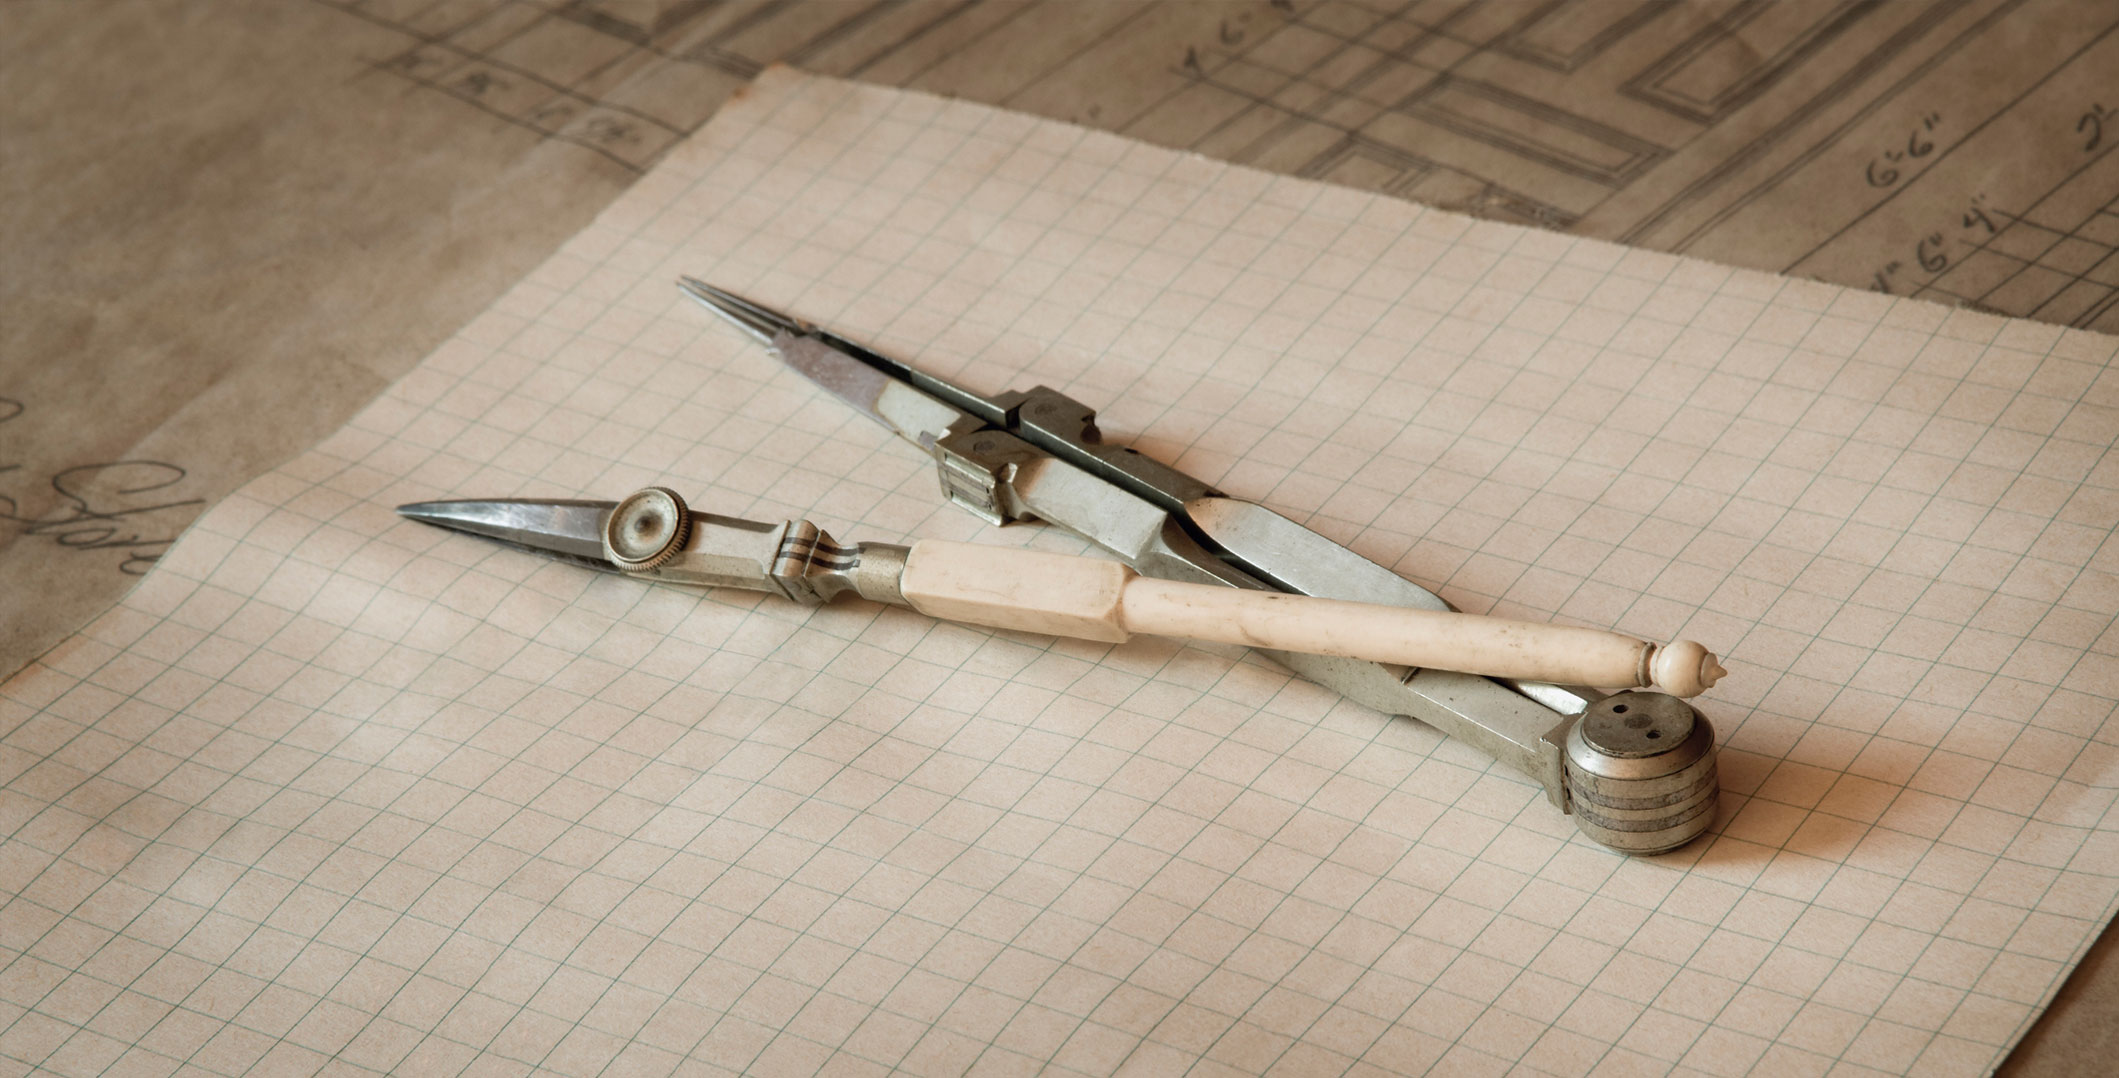 Antique Drafting Tools